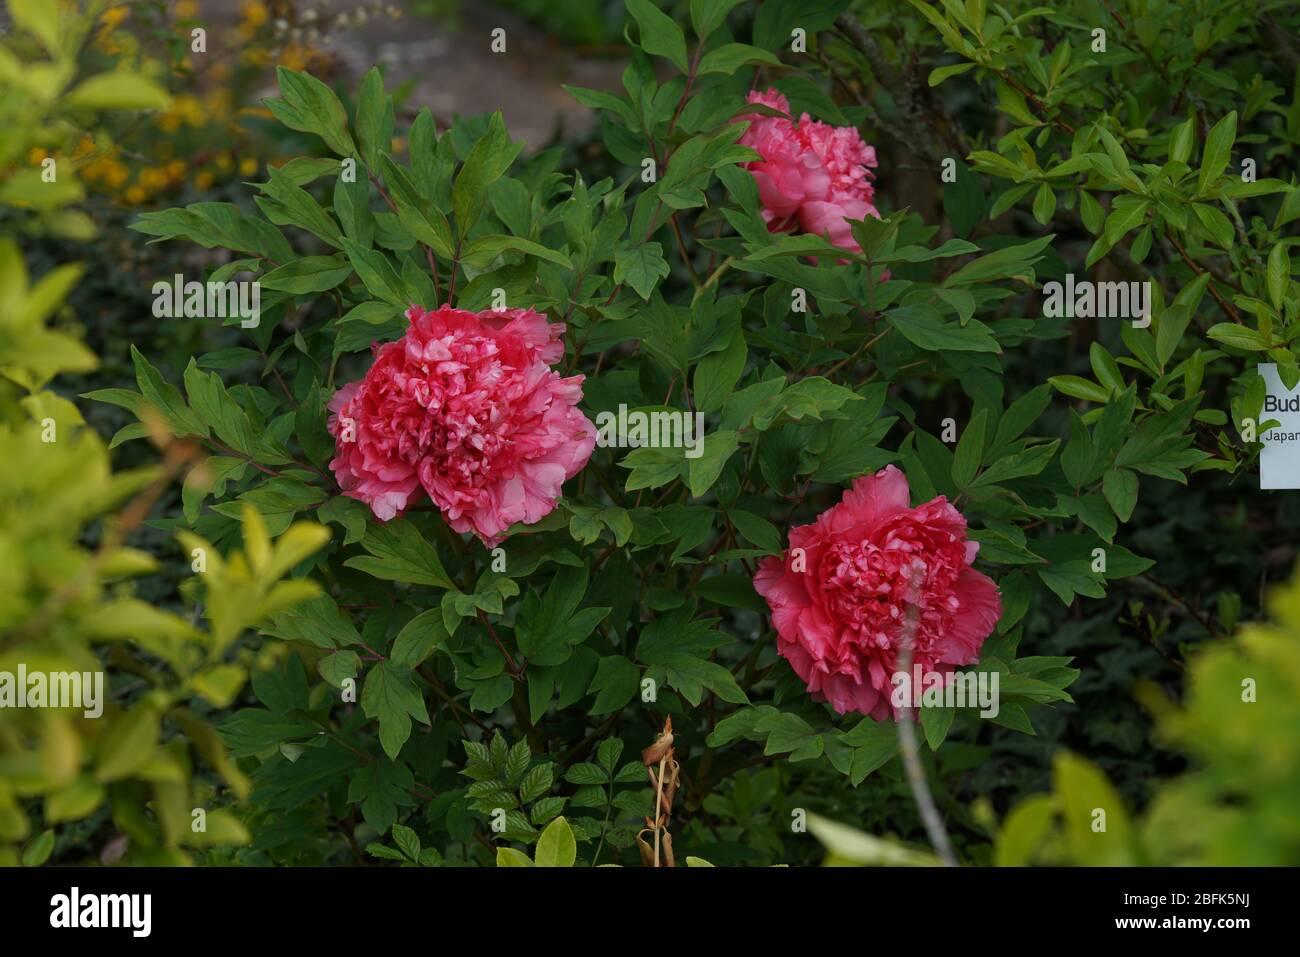 Paeonia officinalis 'Rubra Plena', echte Bauern-Pfingstrose Stock Photo